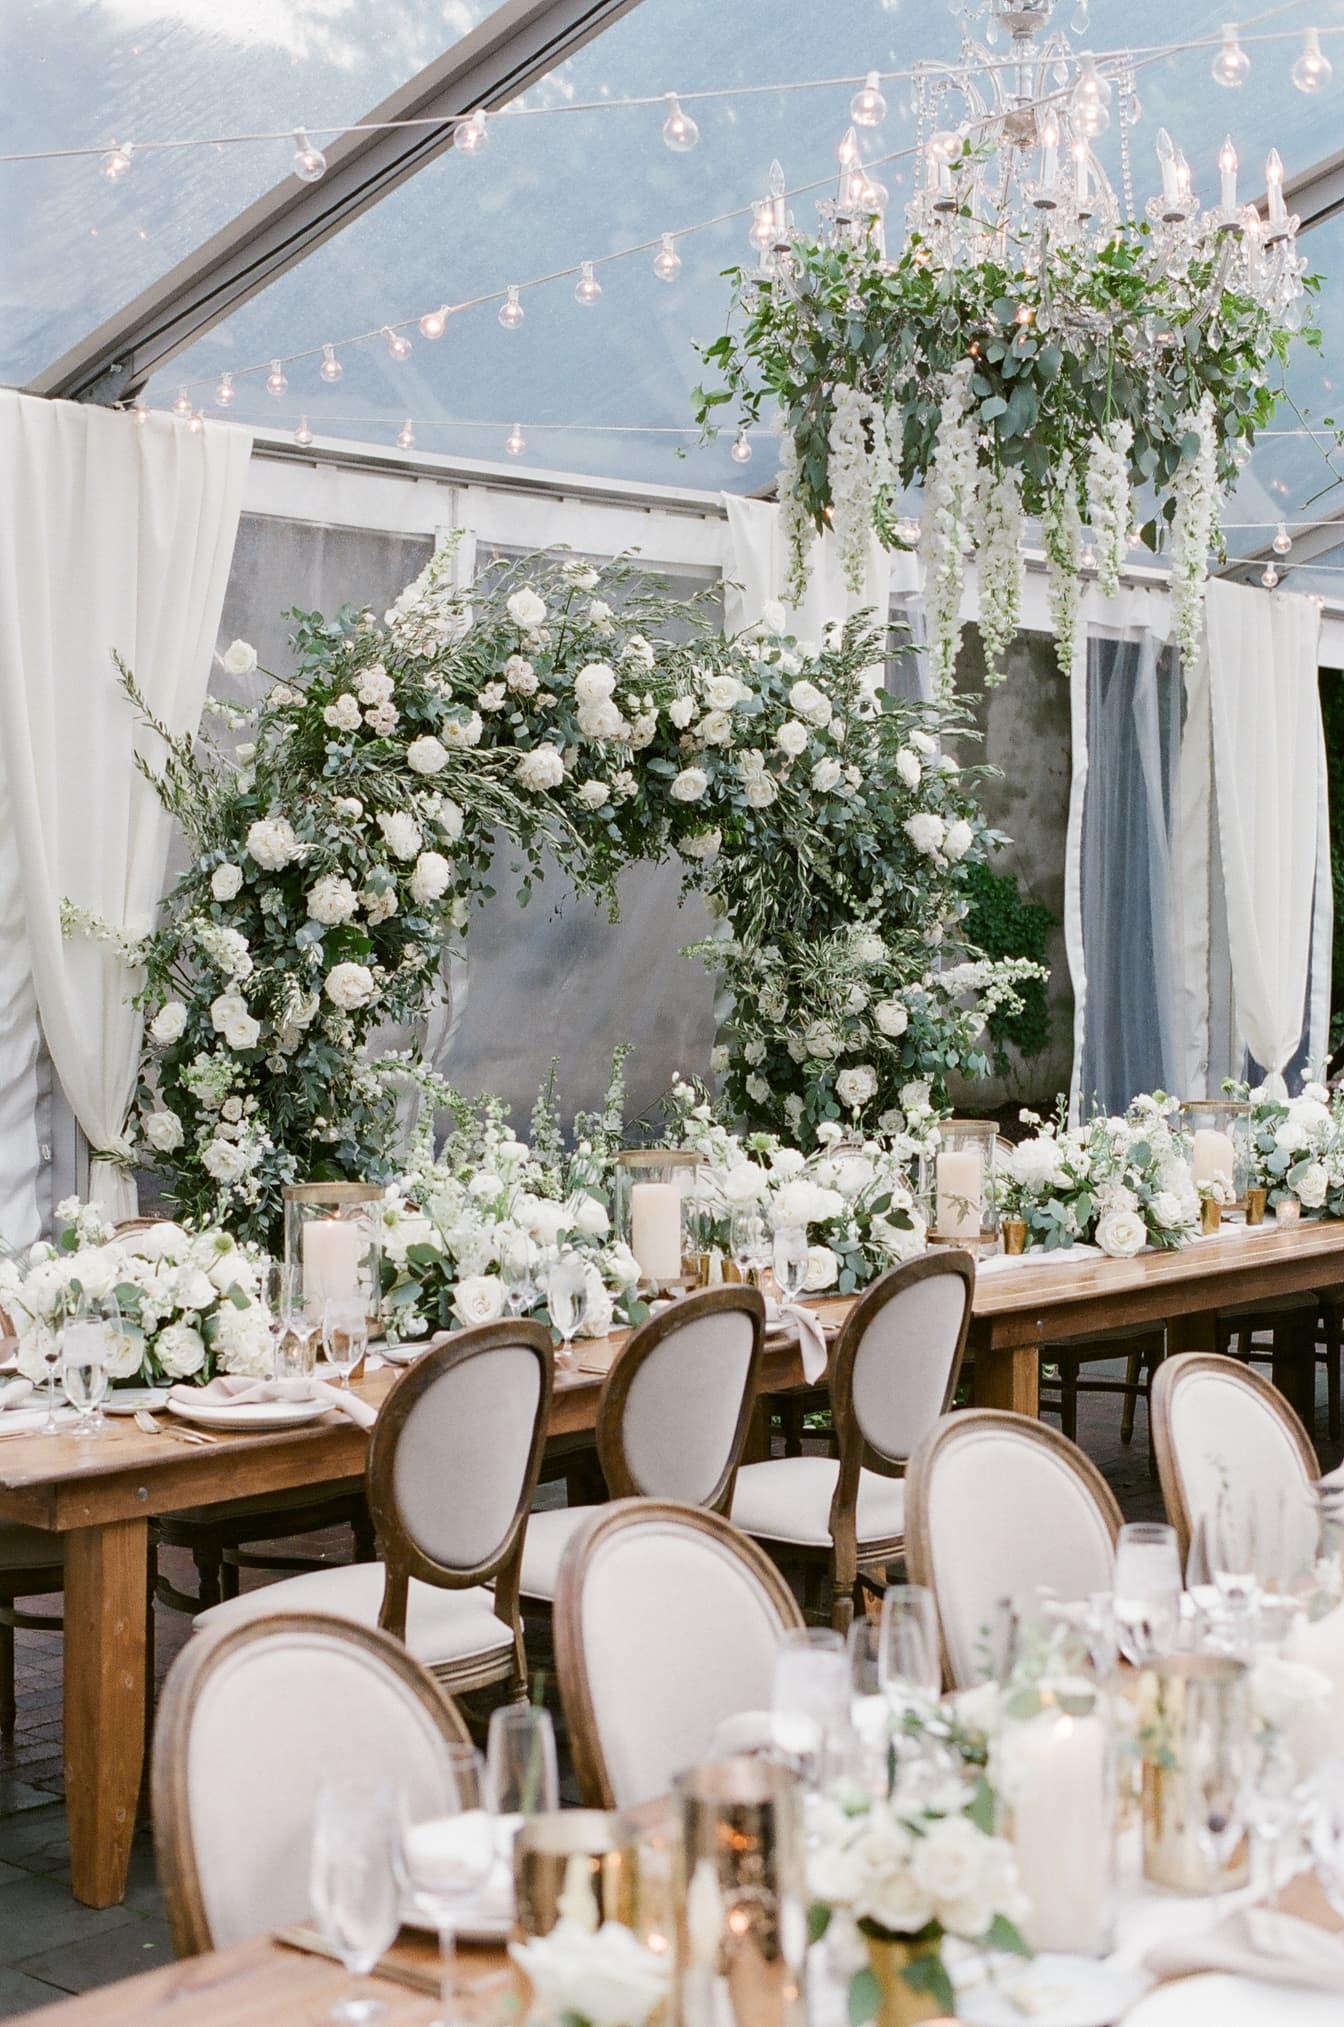 Floral decor at wedding reception at Chicago Illuminating Company